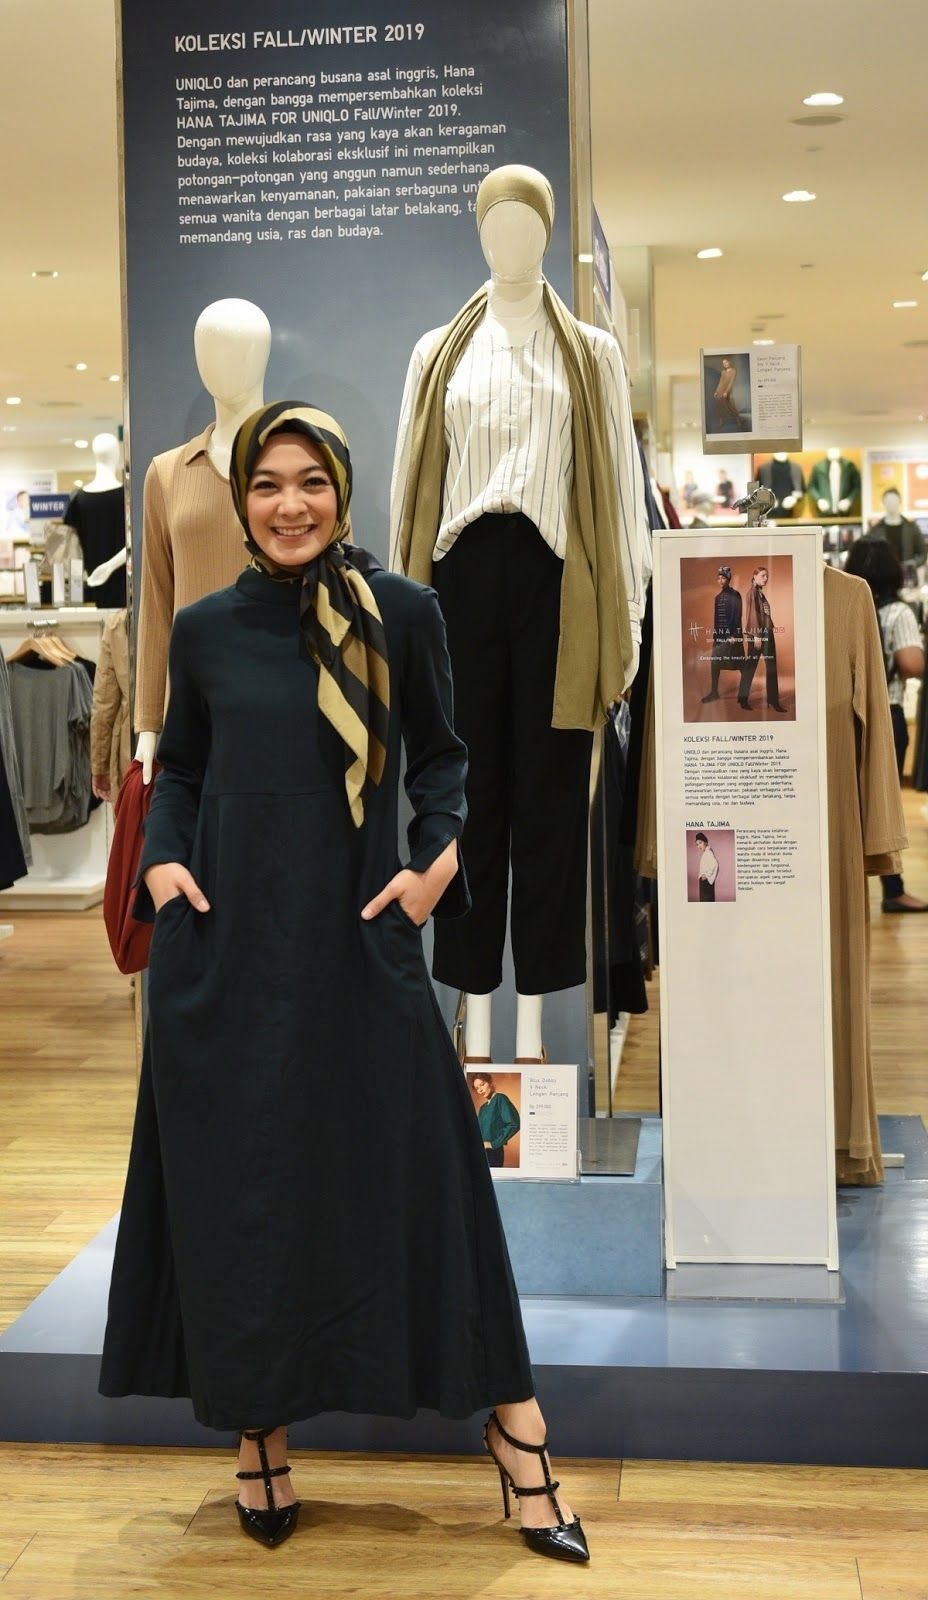 Kesan Feminin & Maskulin Lengkapi Koleksi Hana Tajima For UNIQLO